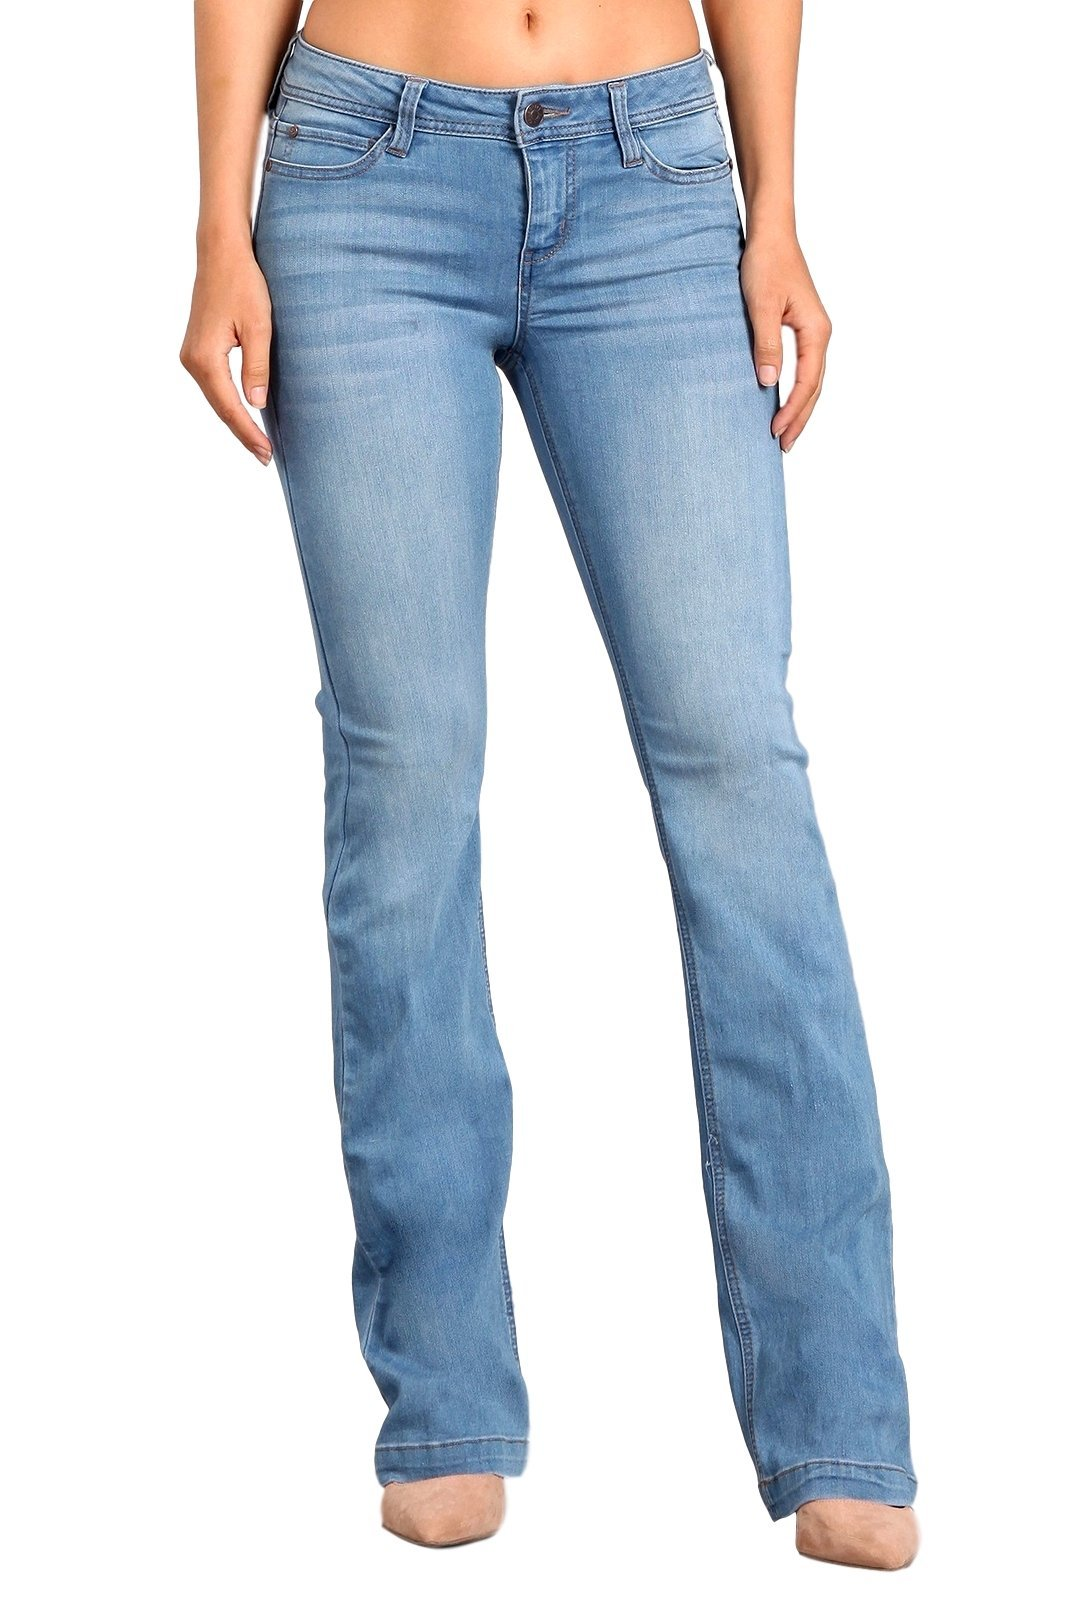 Celebrity Pink Women's Mid Rise Kickboot Jeans 11 Grimes CJ21007H18